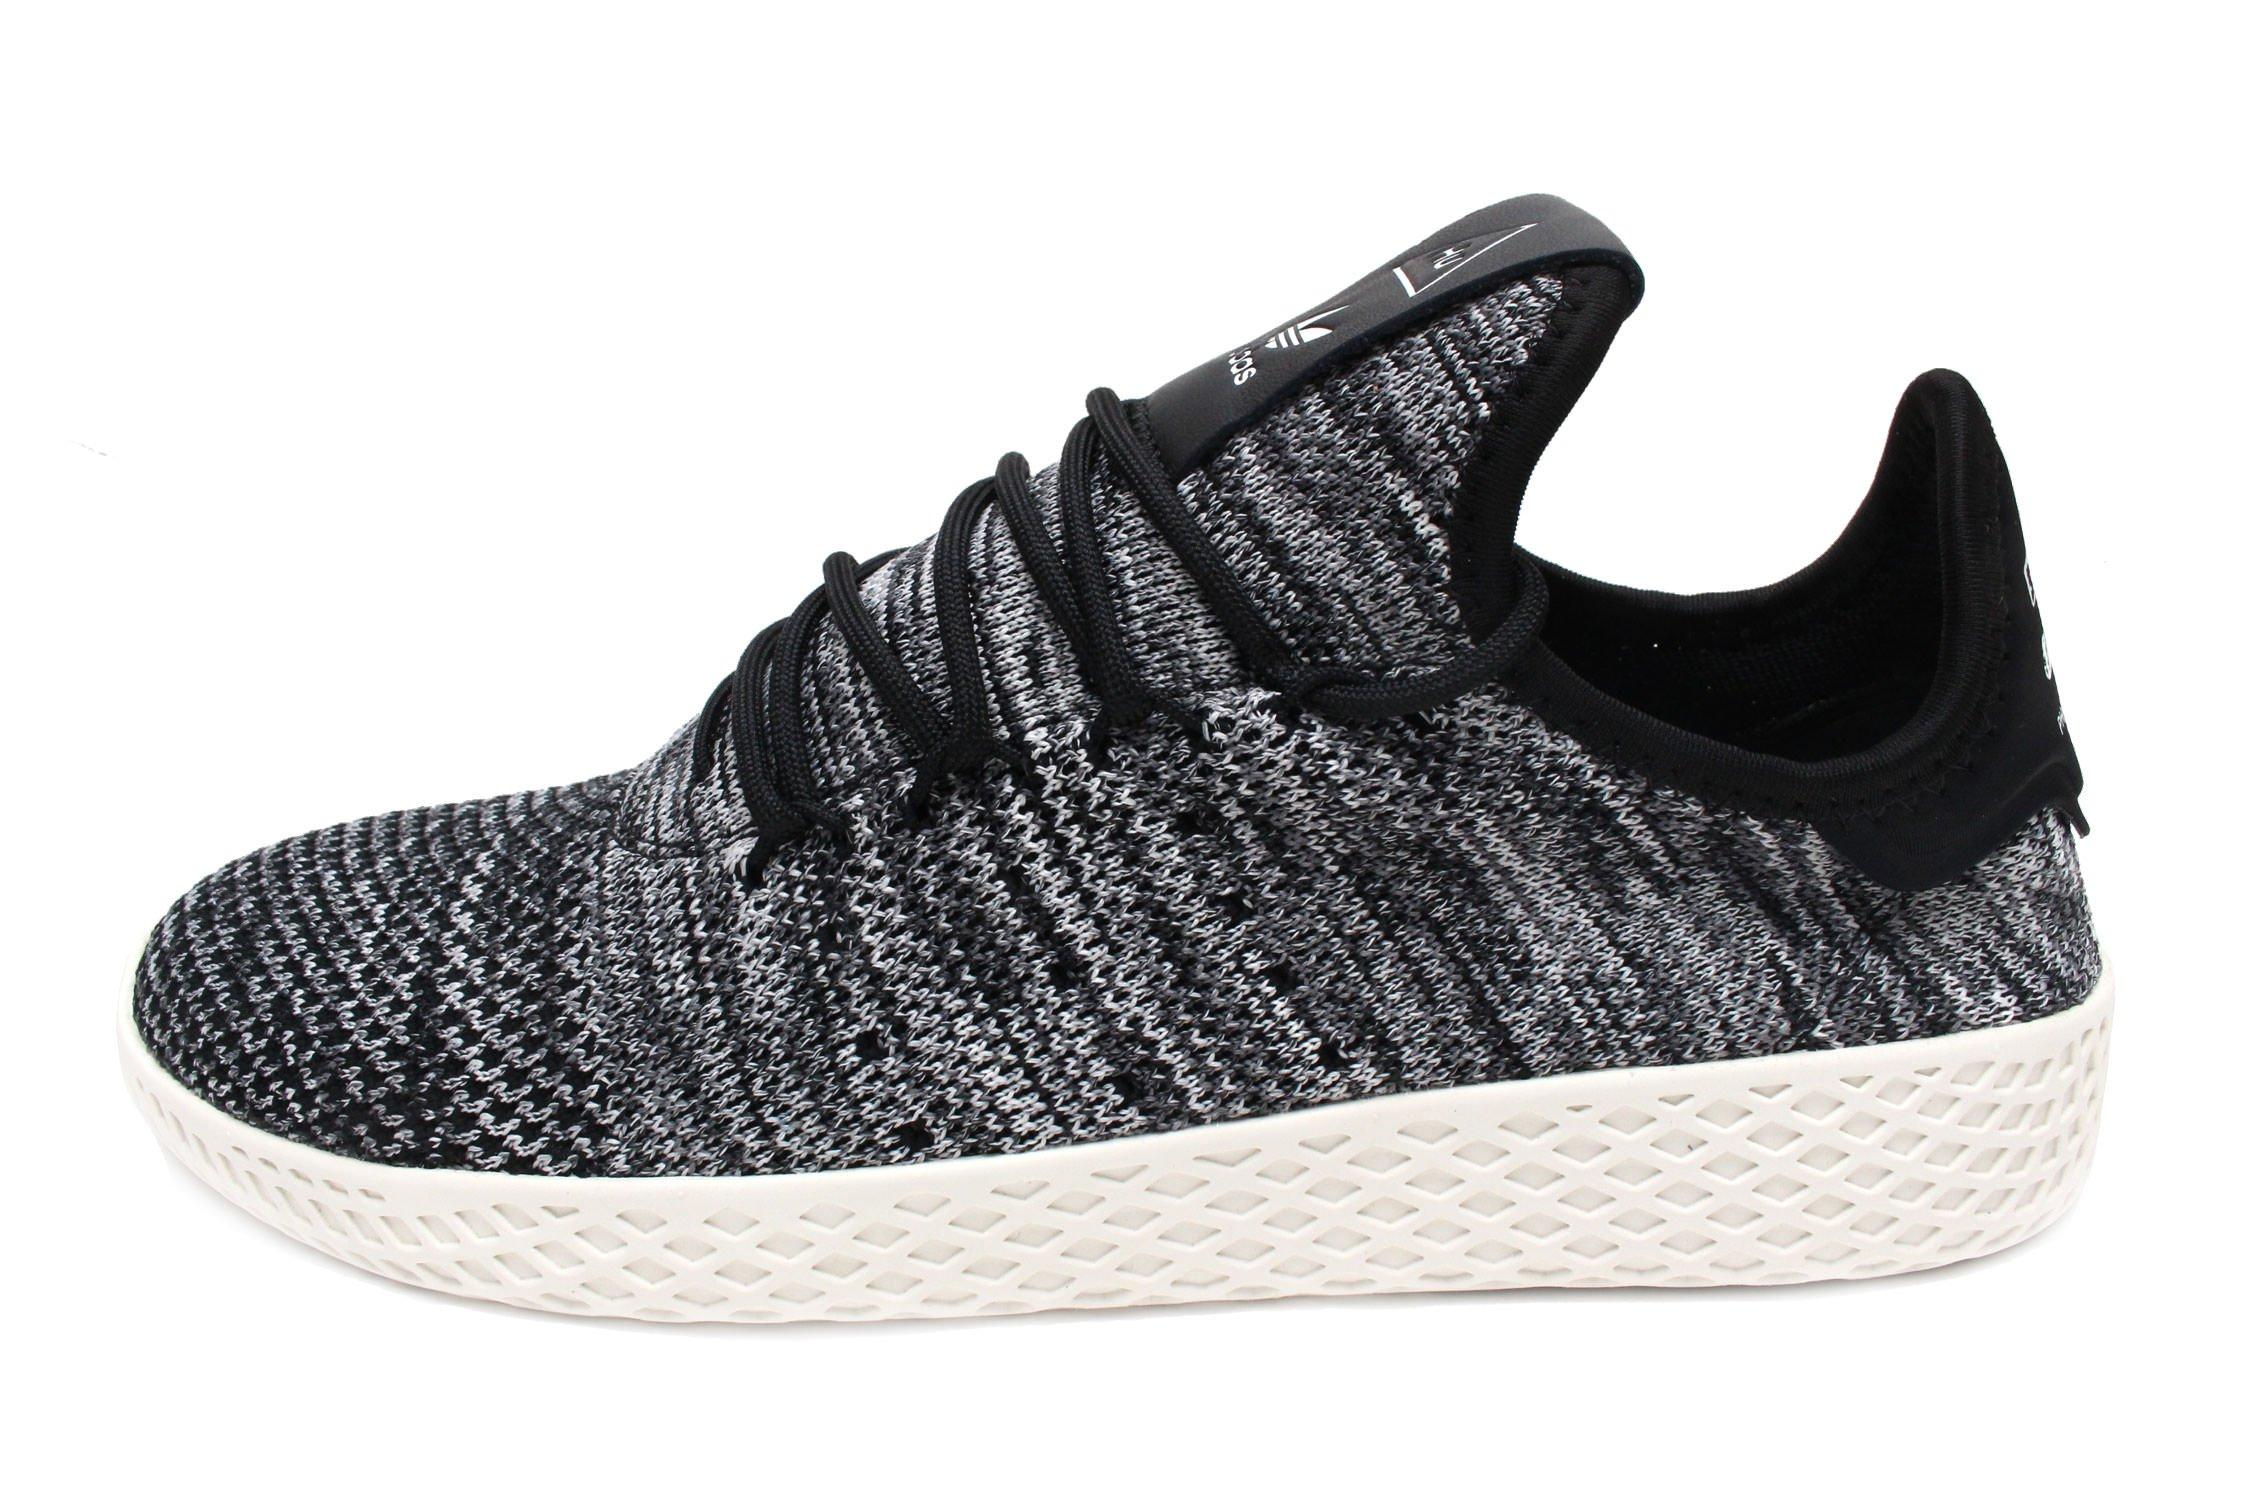 adidas Originals Pharrell Williams Tennis HU Pimeknit Shoe - Men's Casual 4.5 Chalk White/Core Black/Cloud White